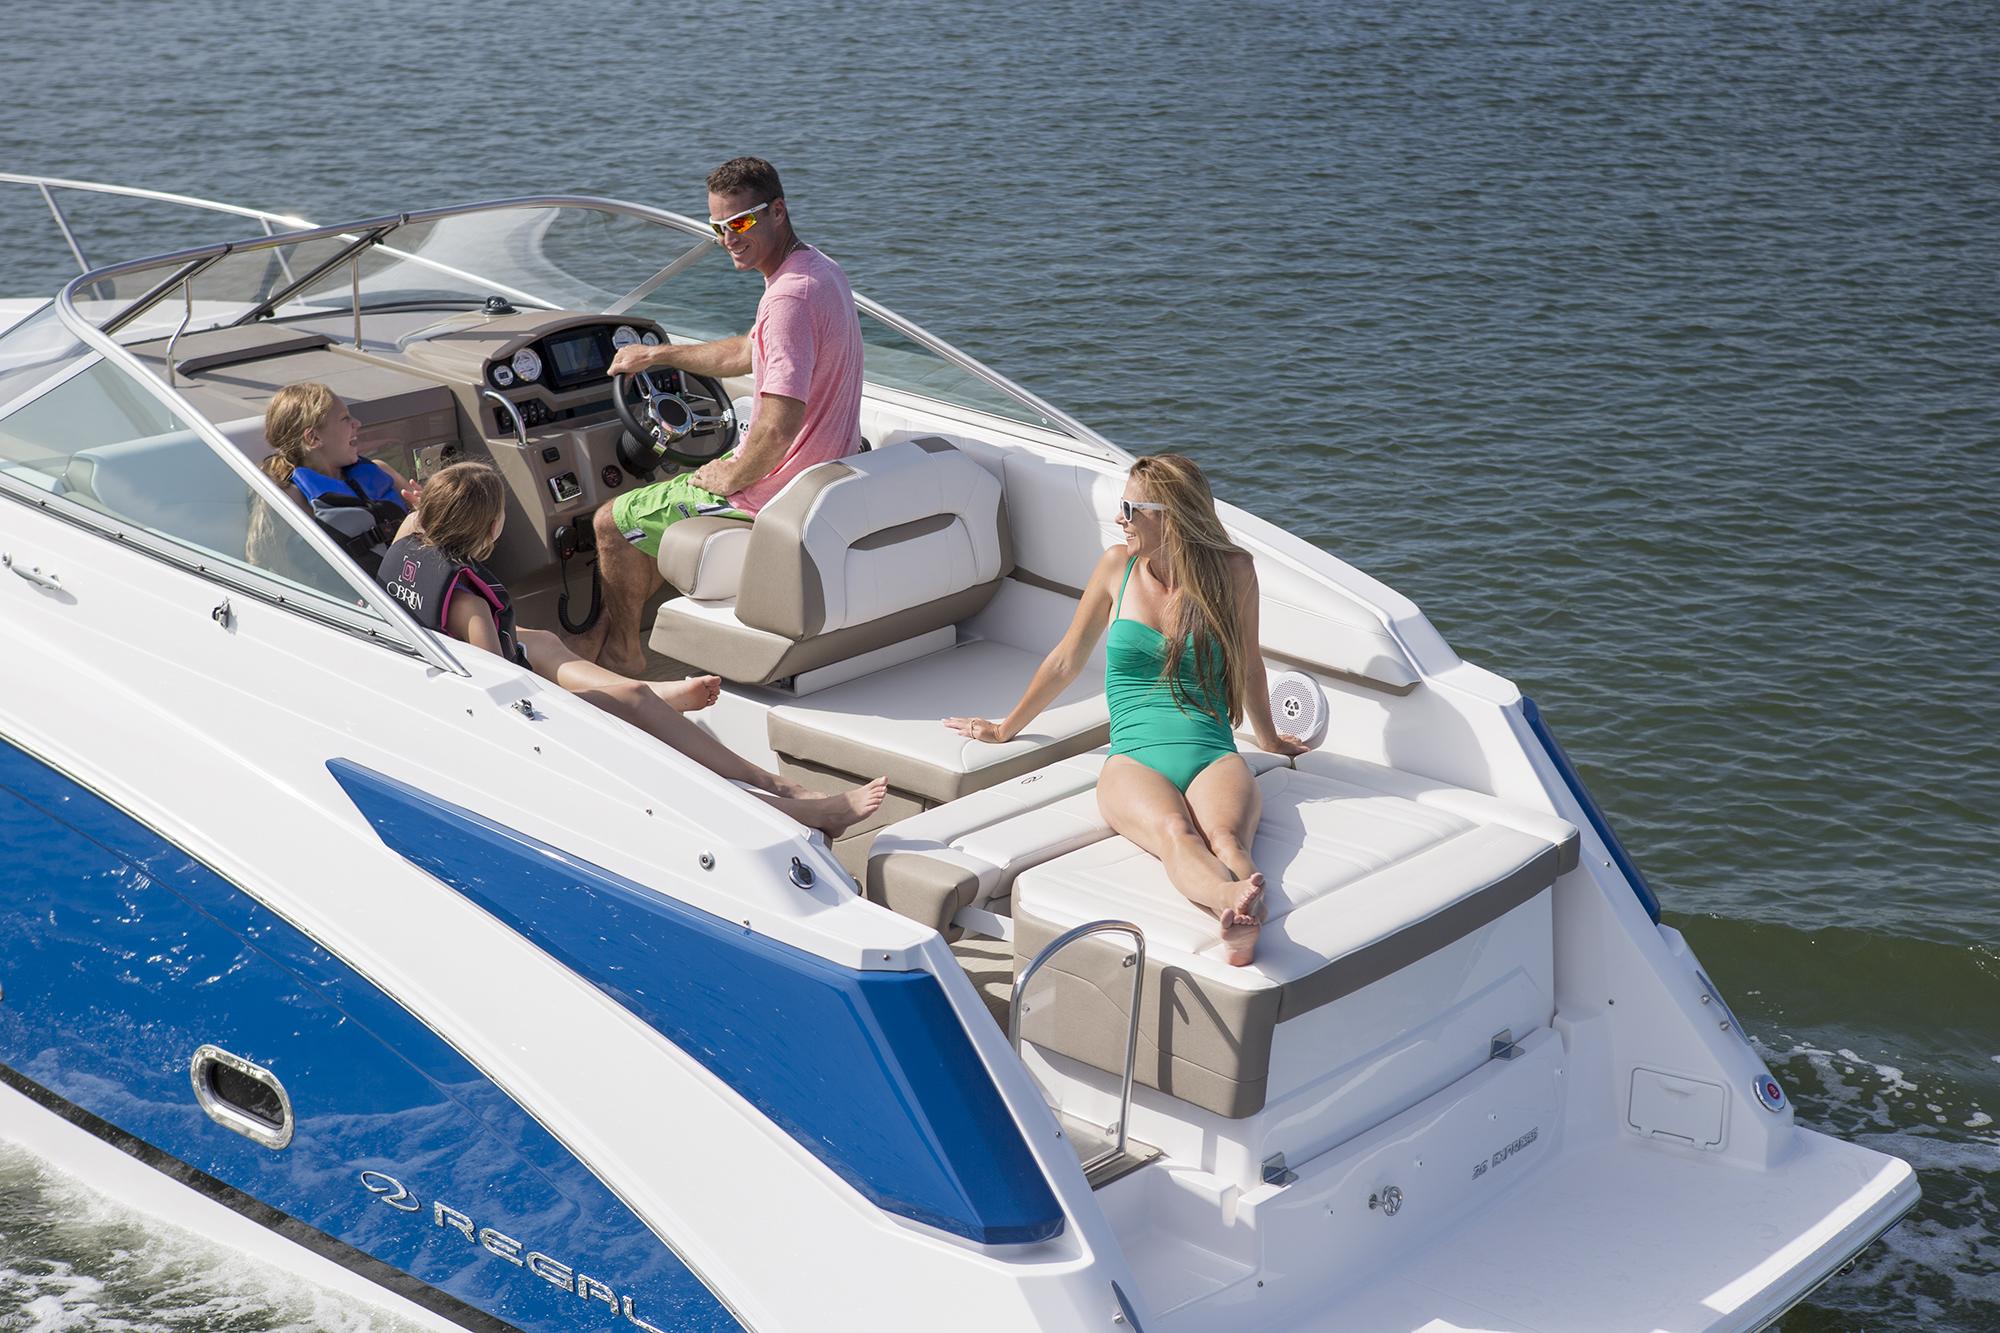 boat trip full movie dual audio download